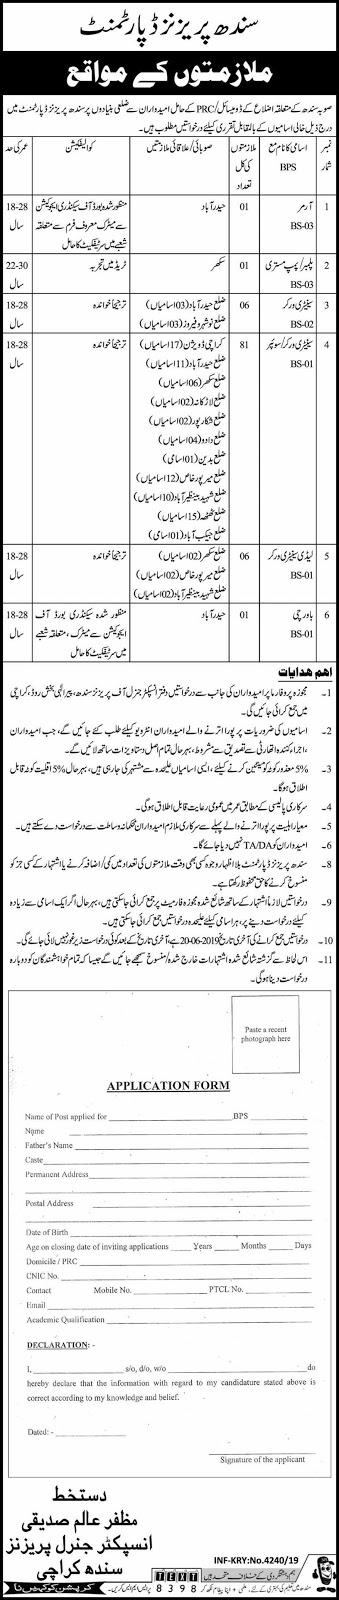 Sindh Prisons Department 01 Aug 2019